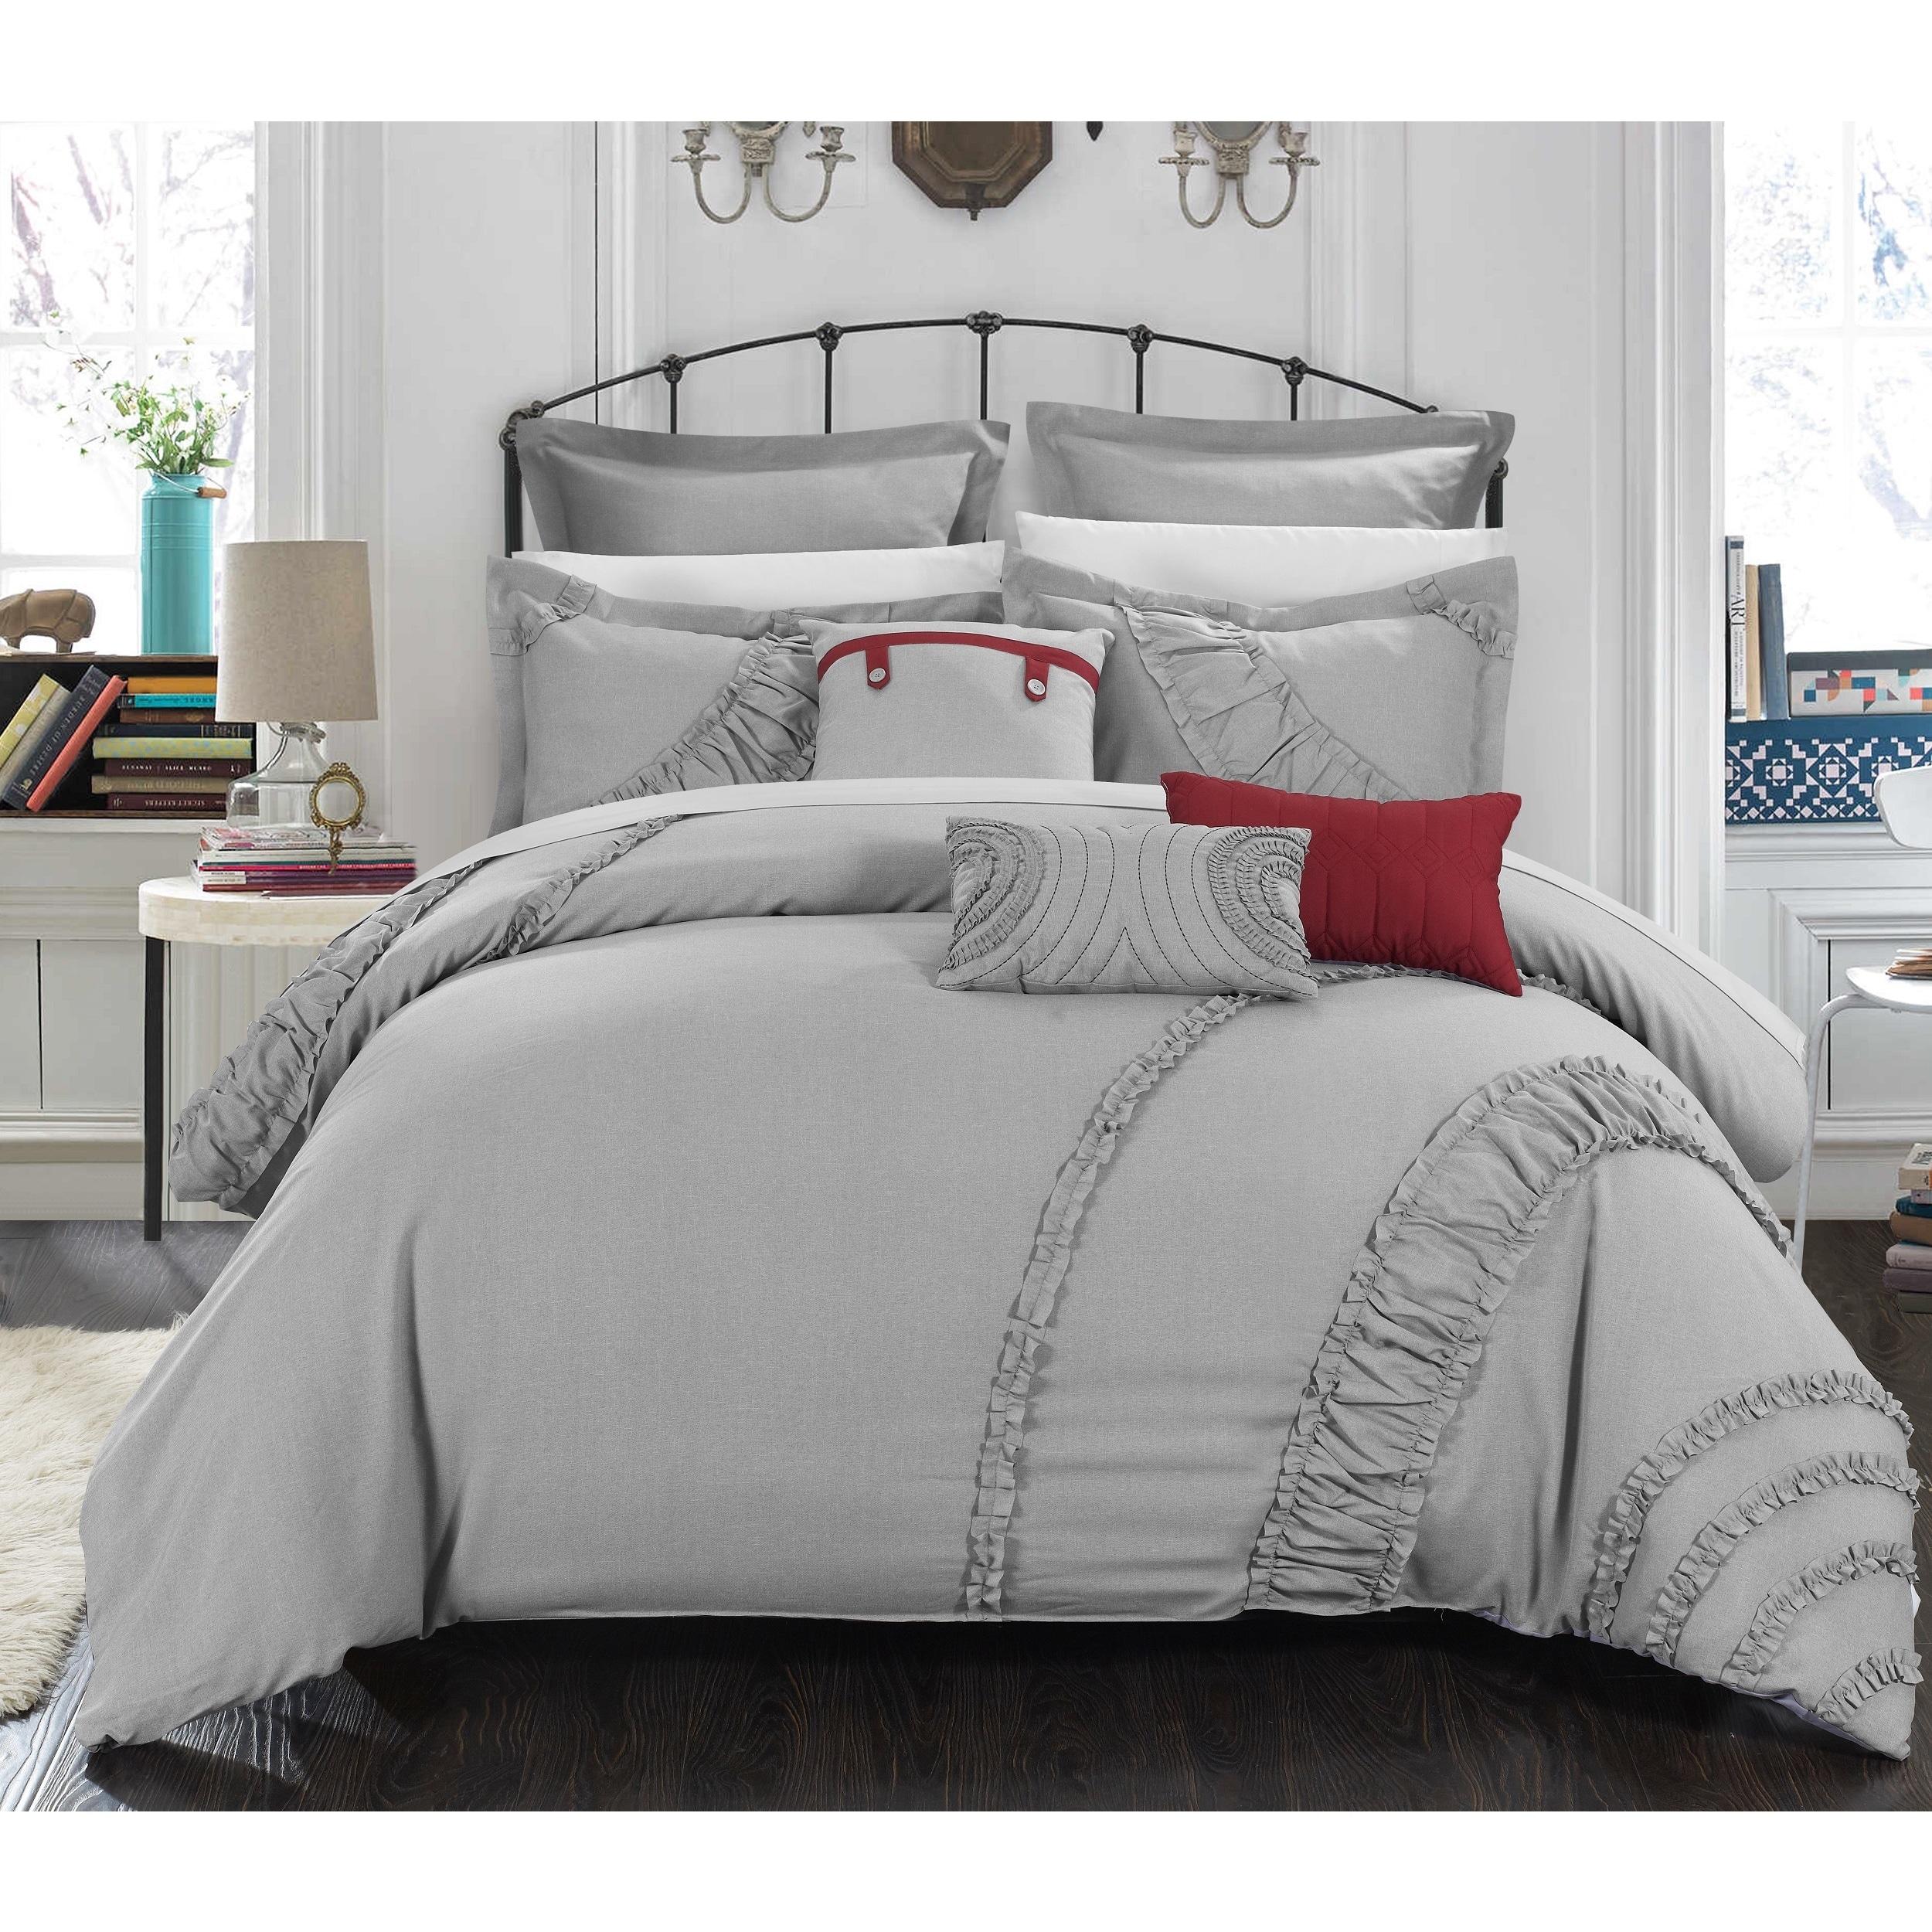 comforter bedding reviews linen amrita count allmodern set cotton thread medallion pdp